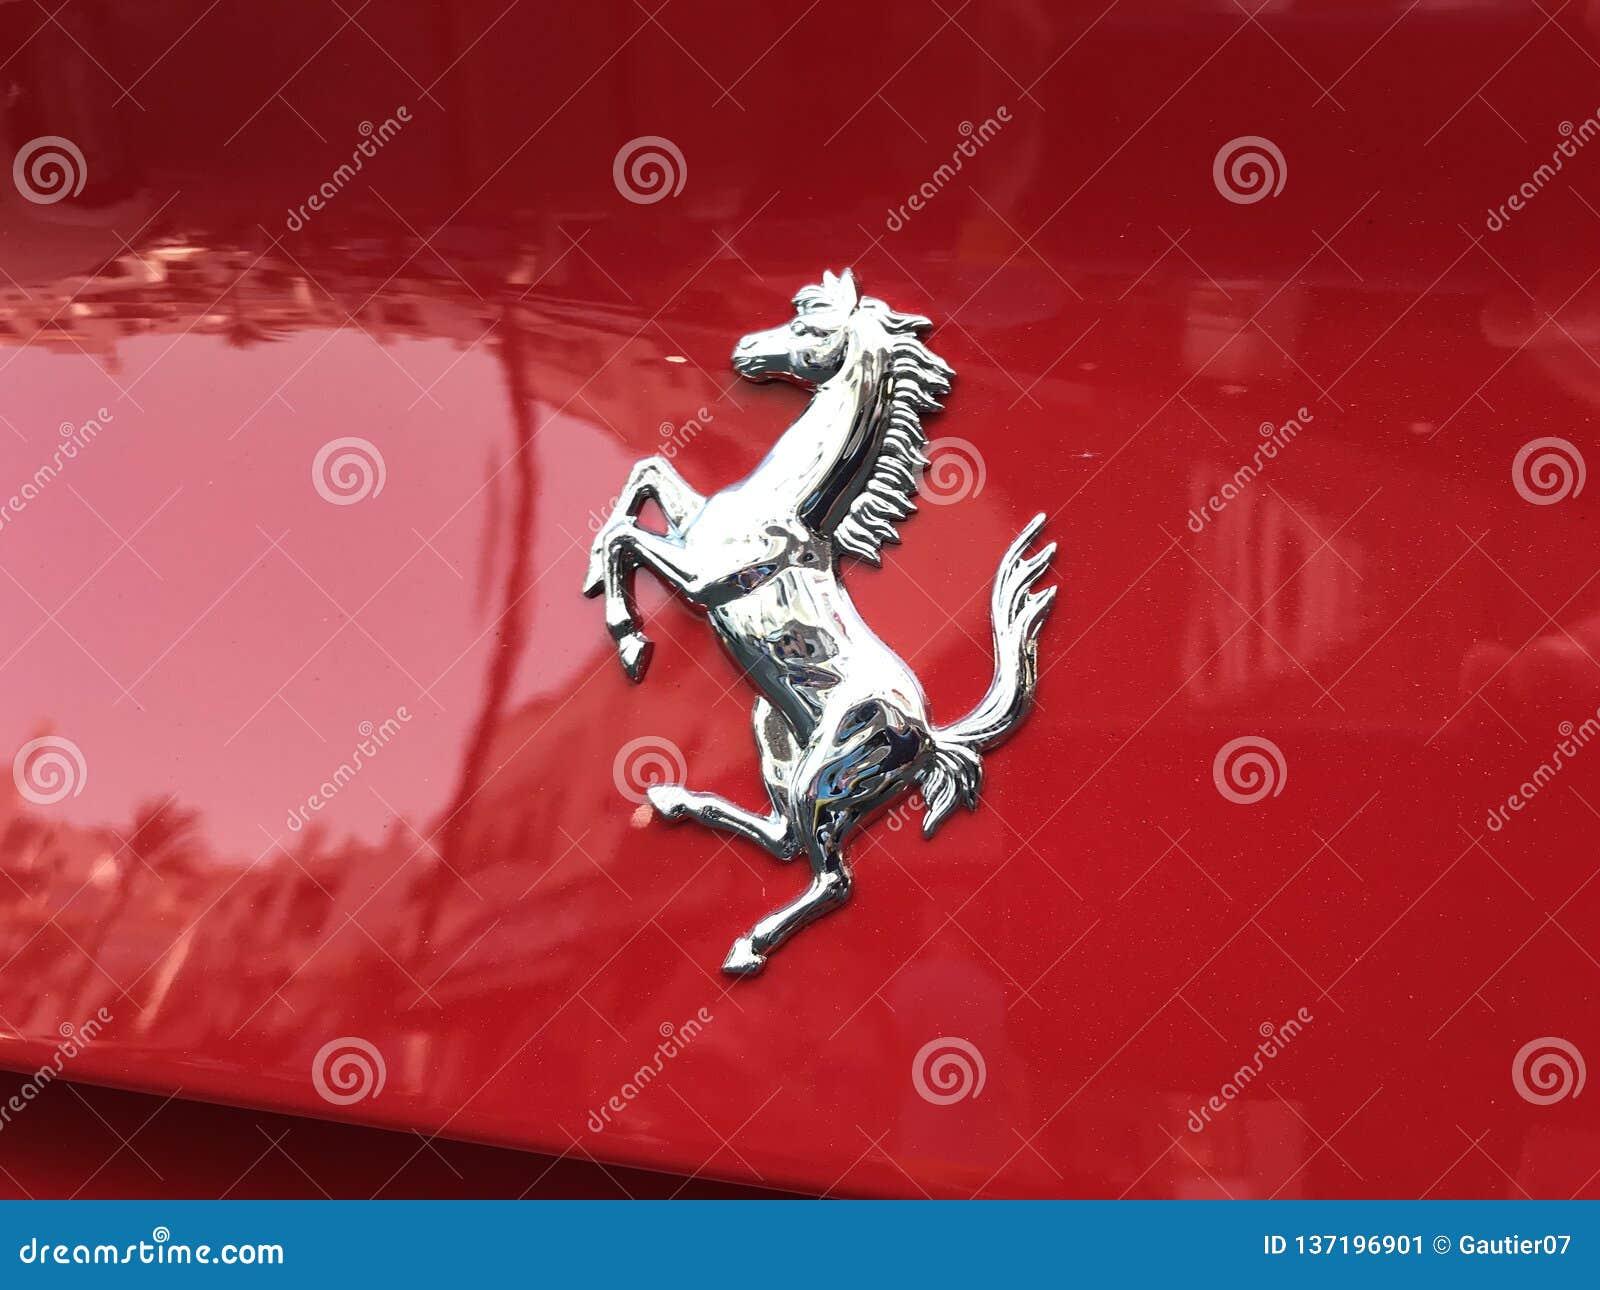 Horse Logo Of Ferrari Red Car Editorial Photo Image Of Sail